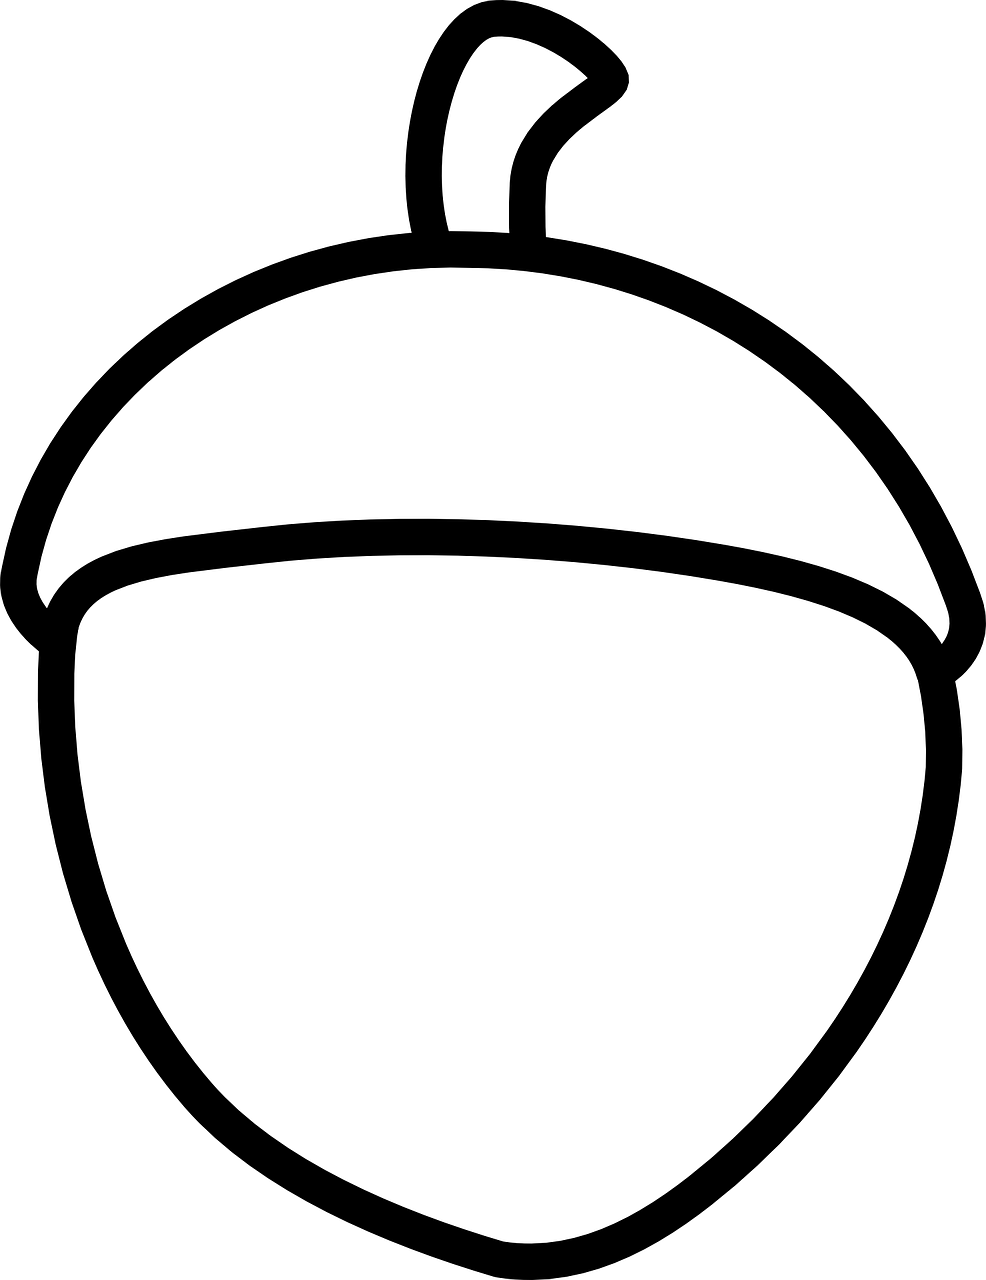 Acorn Sketch Autumn Free Vector Graphic On Pixabay